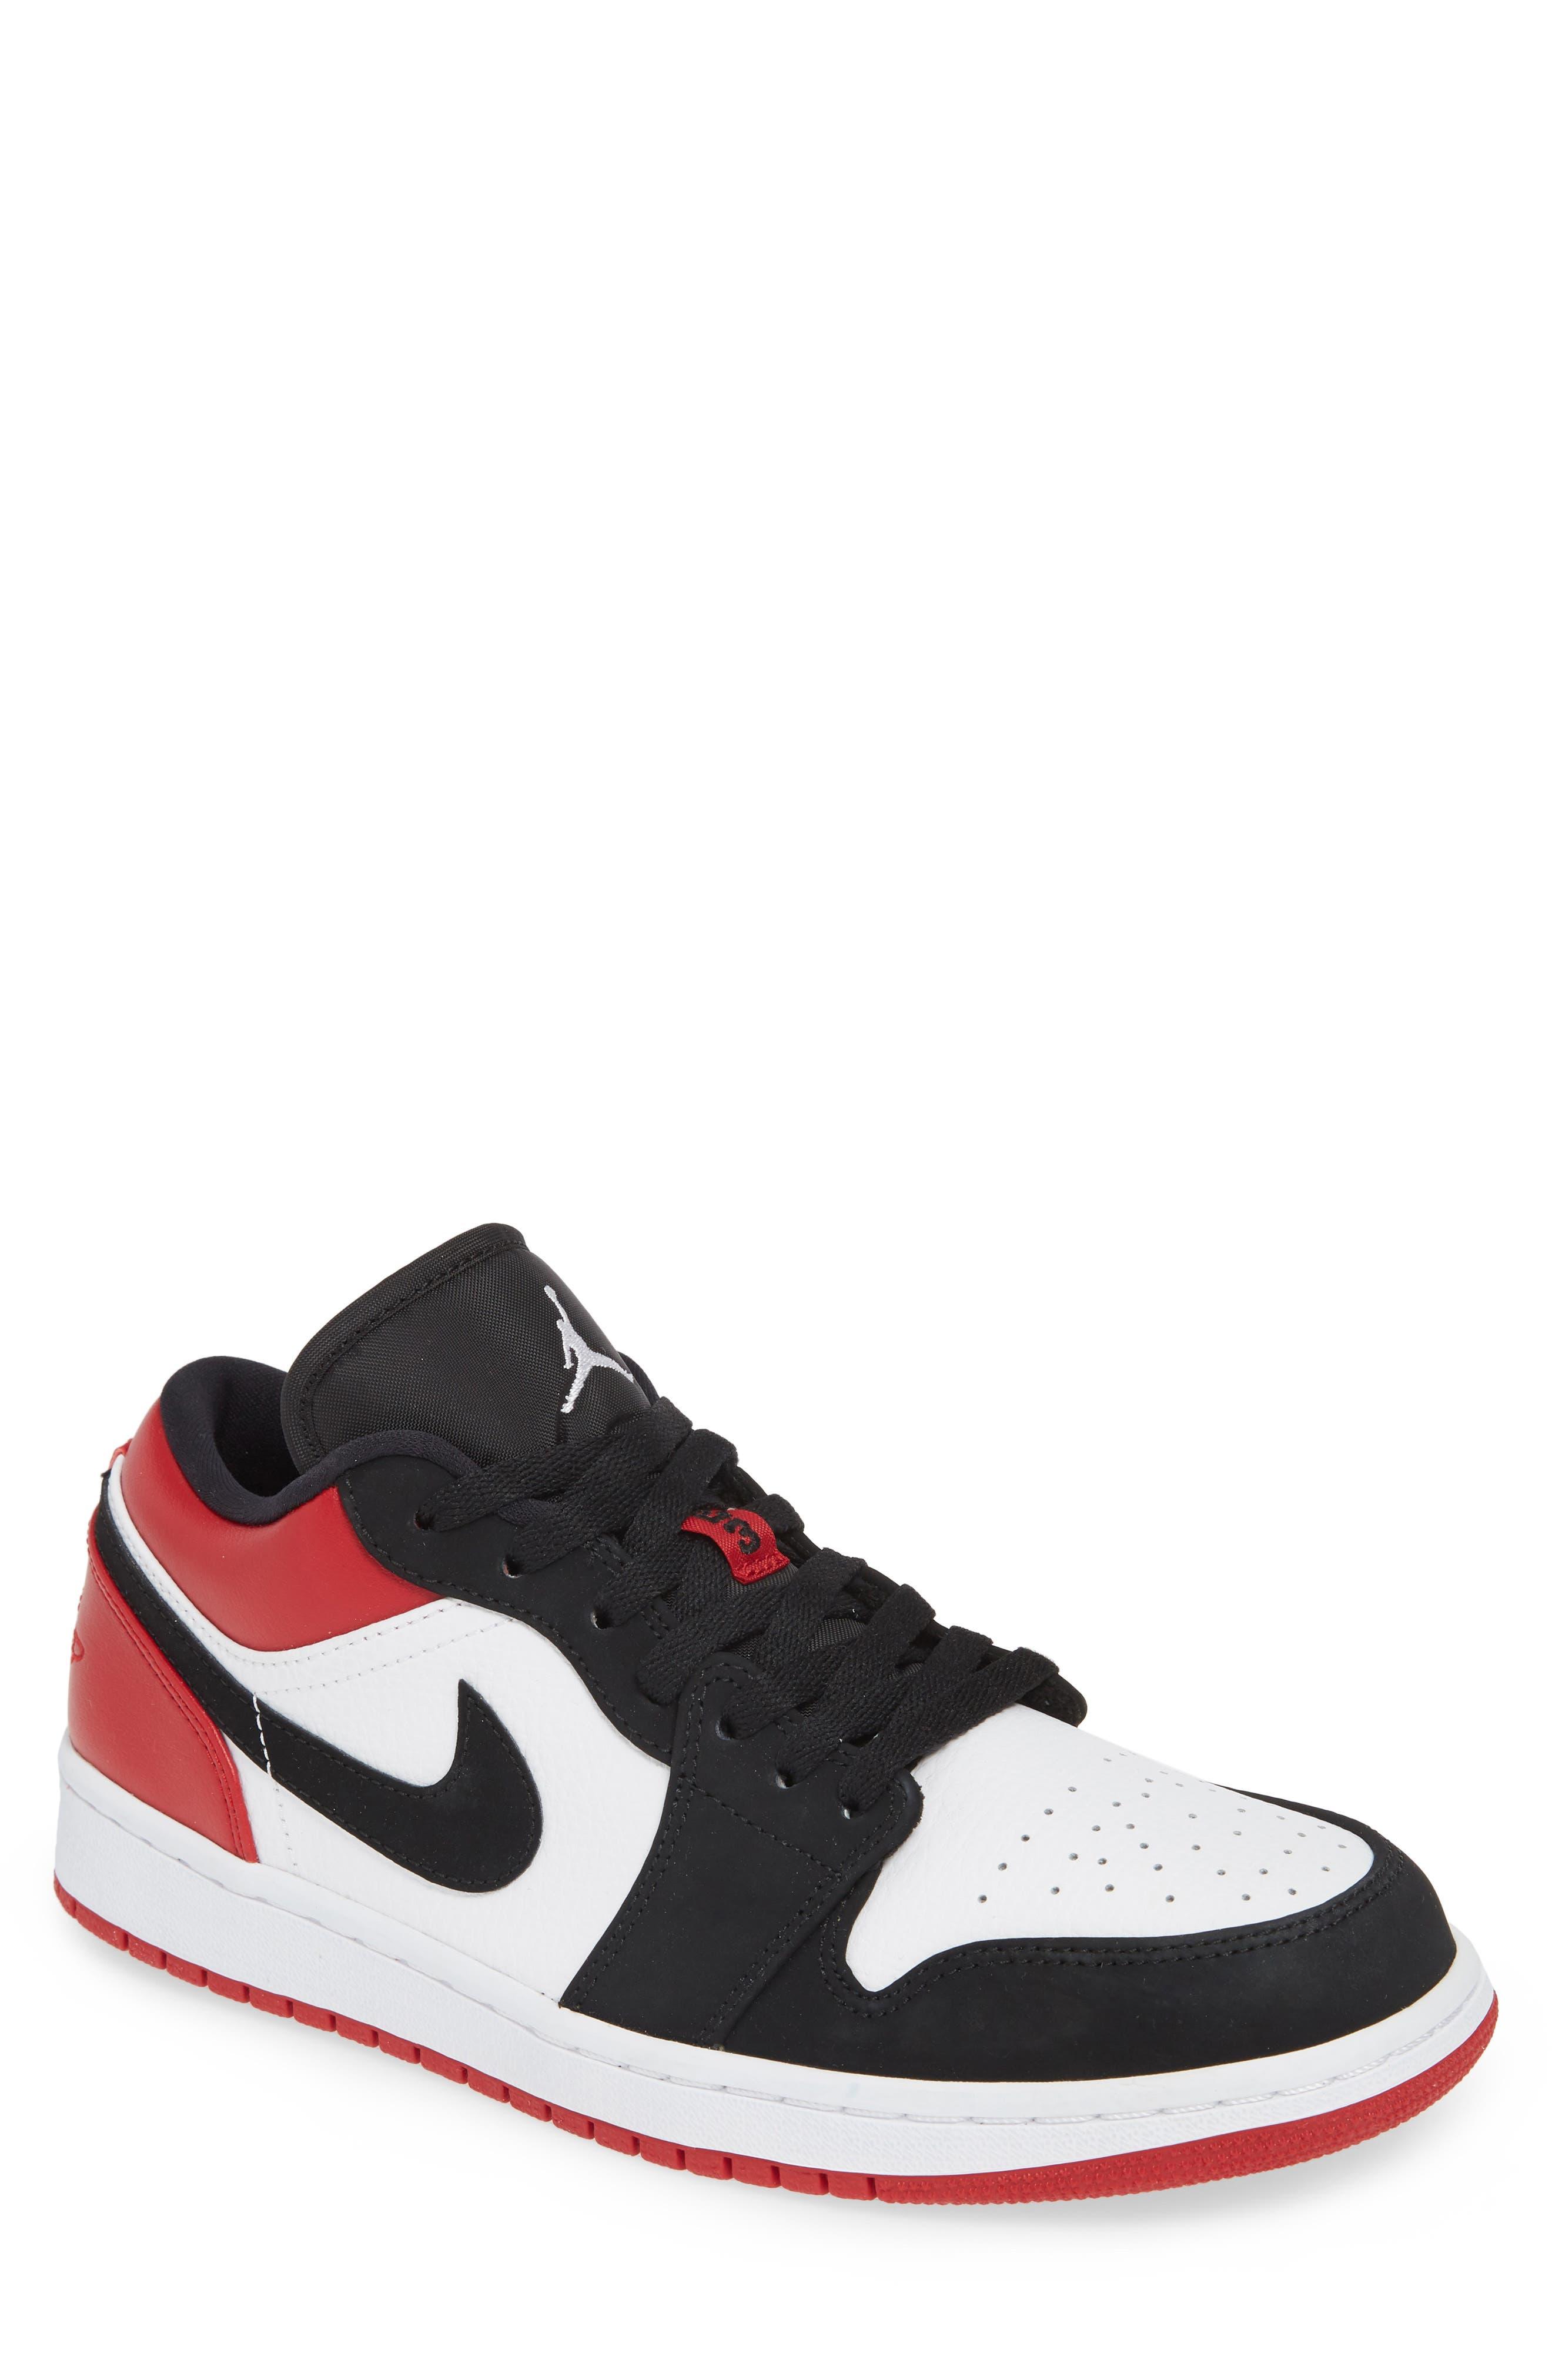 on sale 63de4 054d9 Nike   Nordstrom